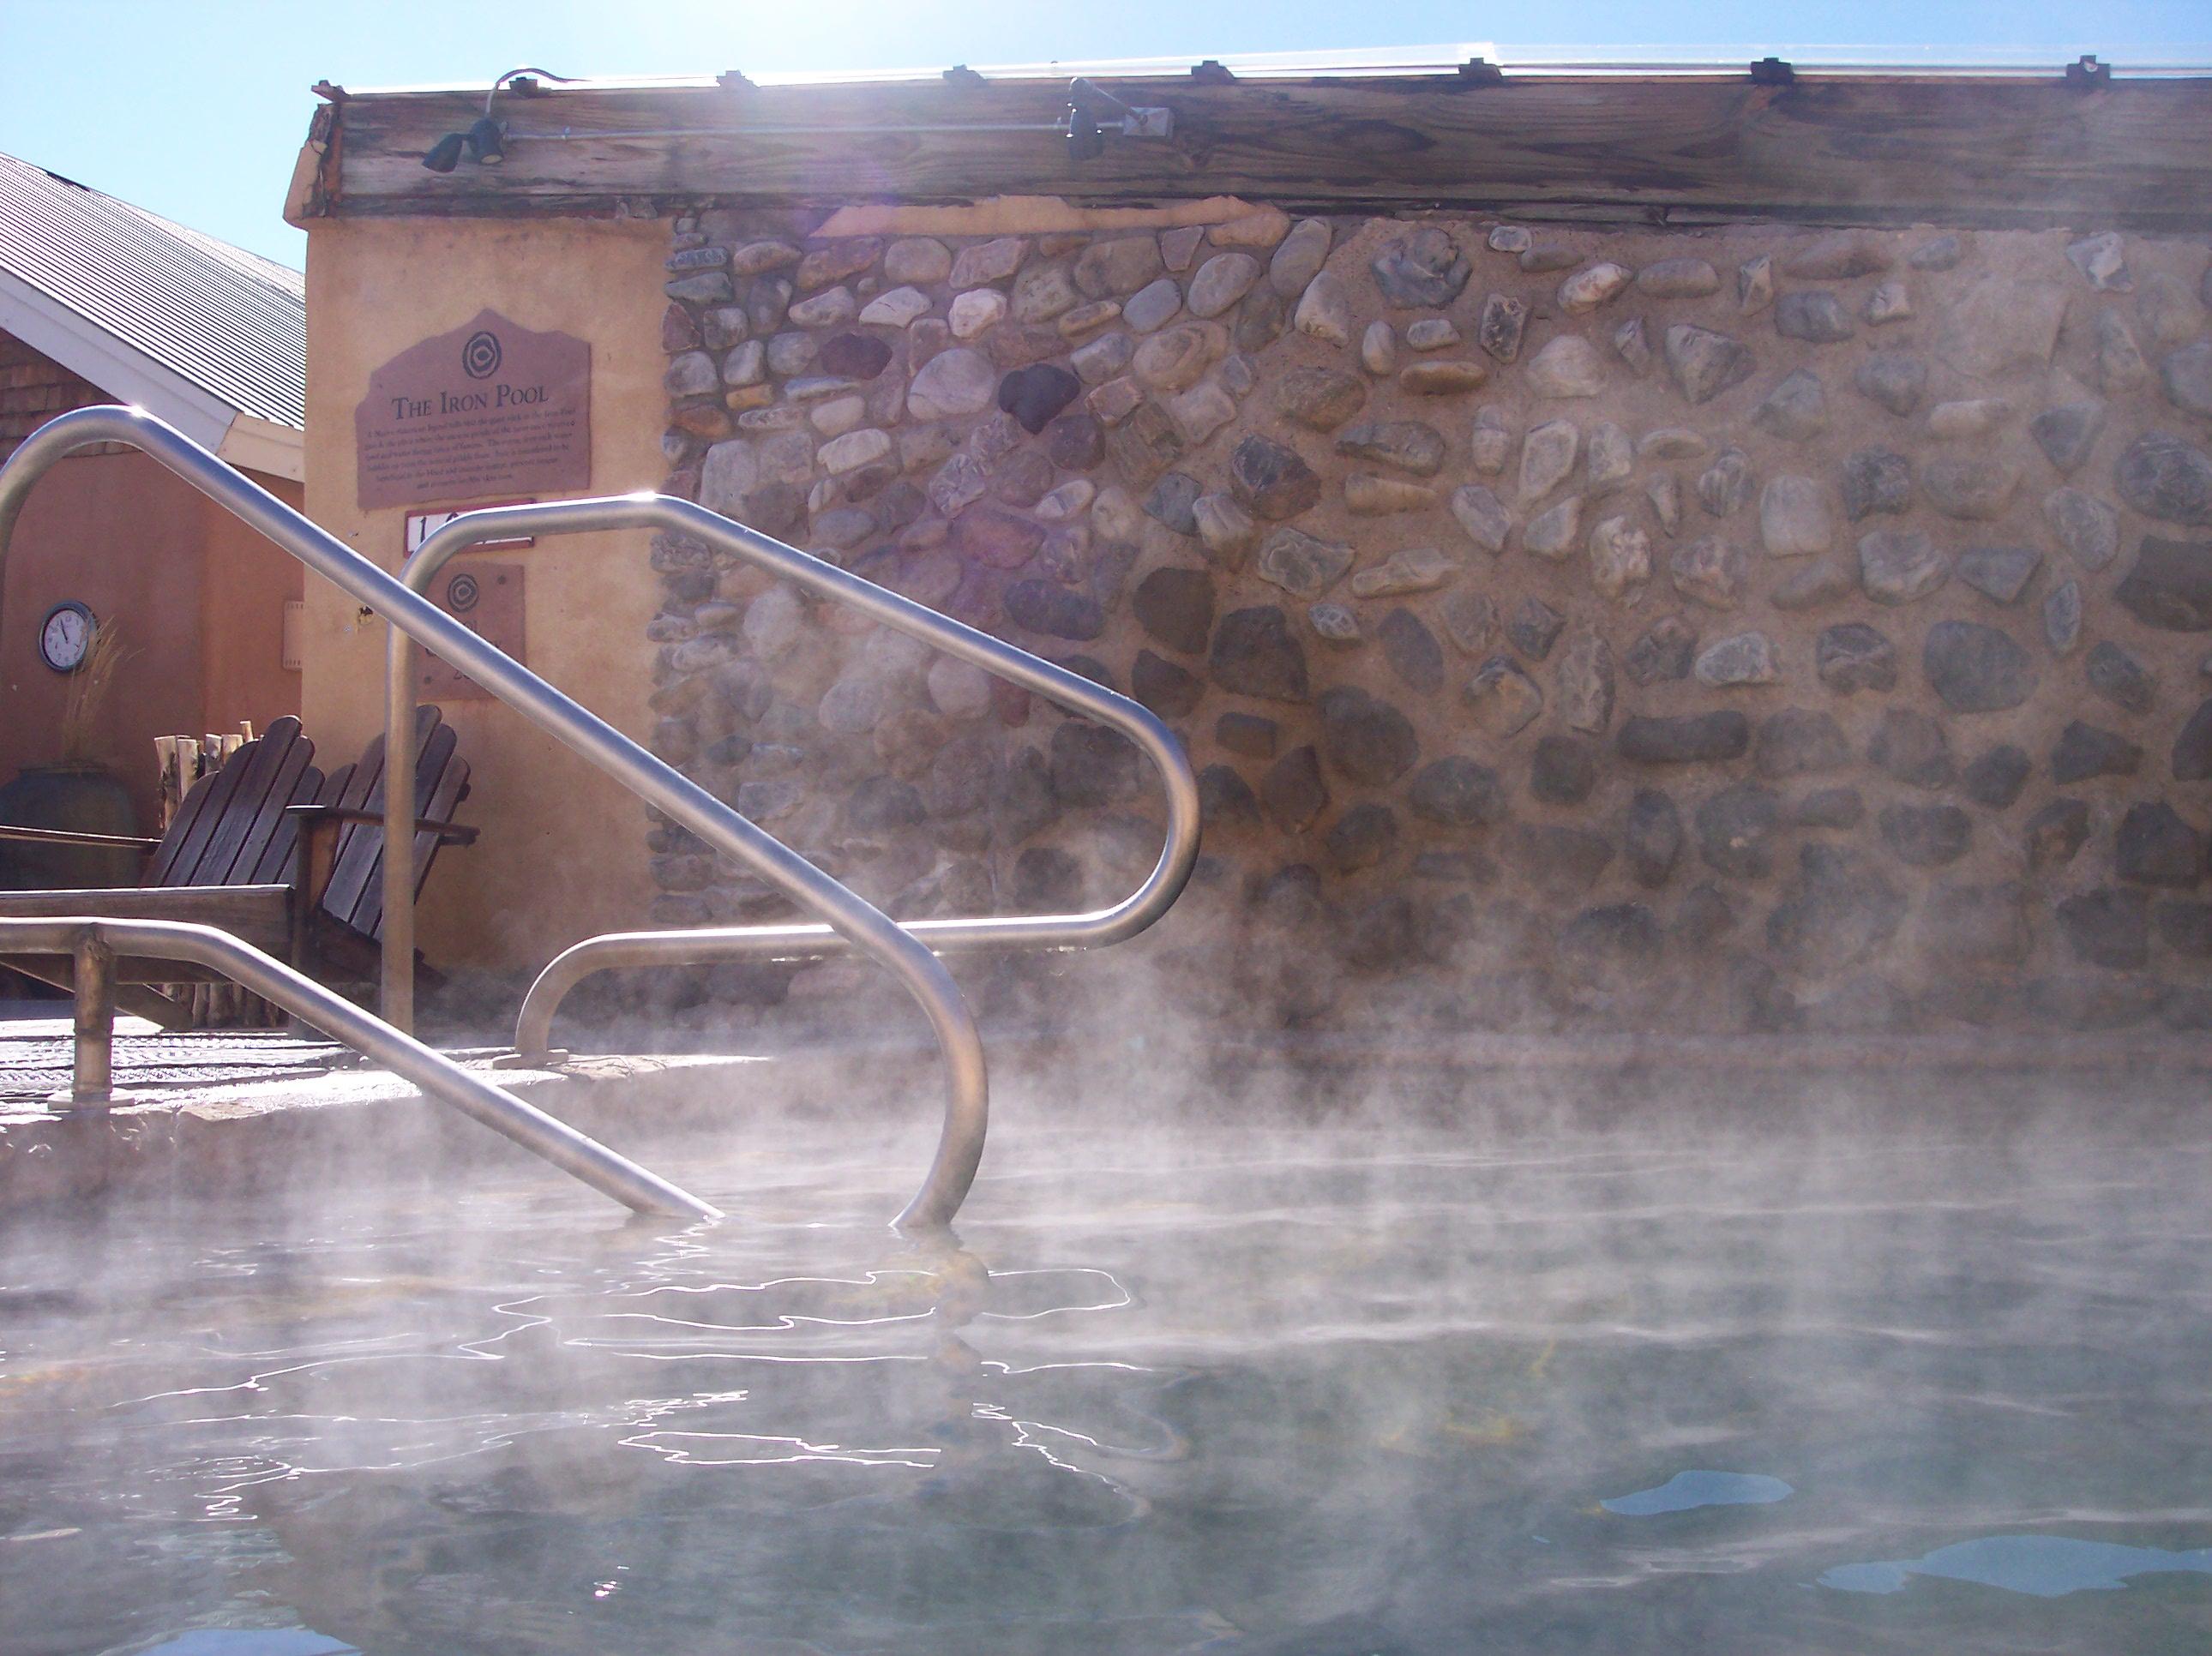 The Iron pool